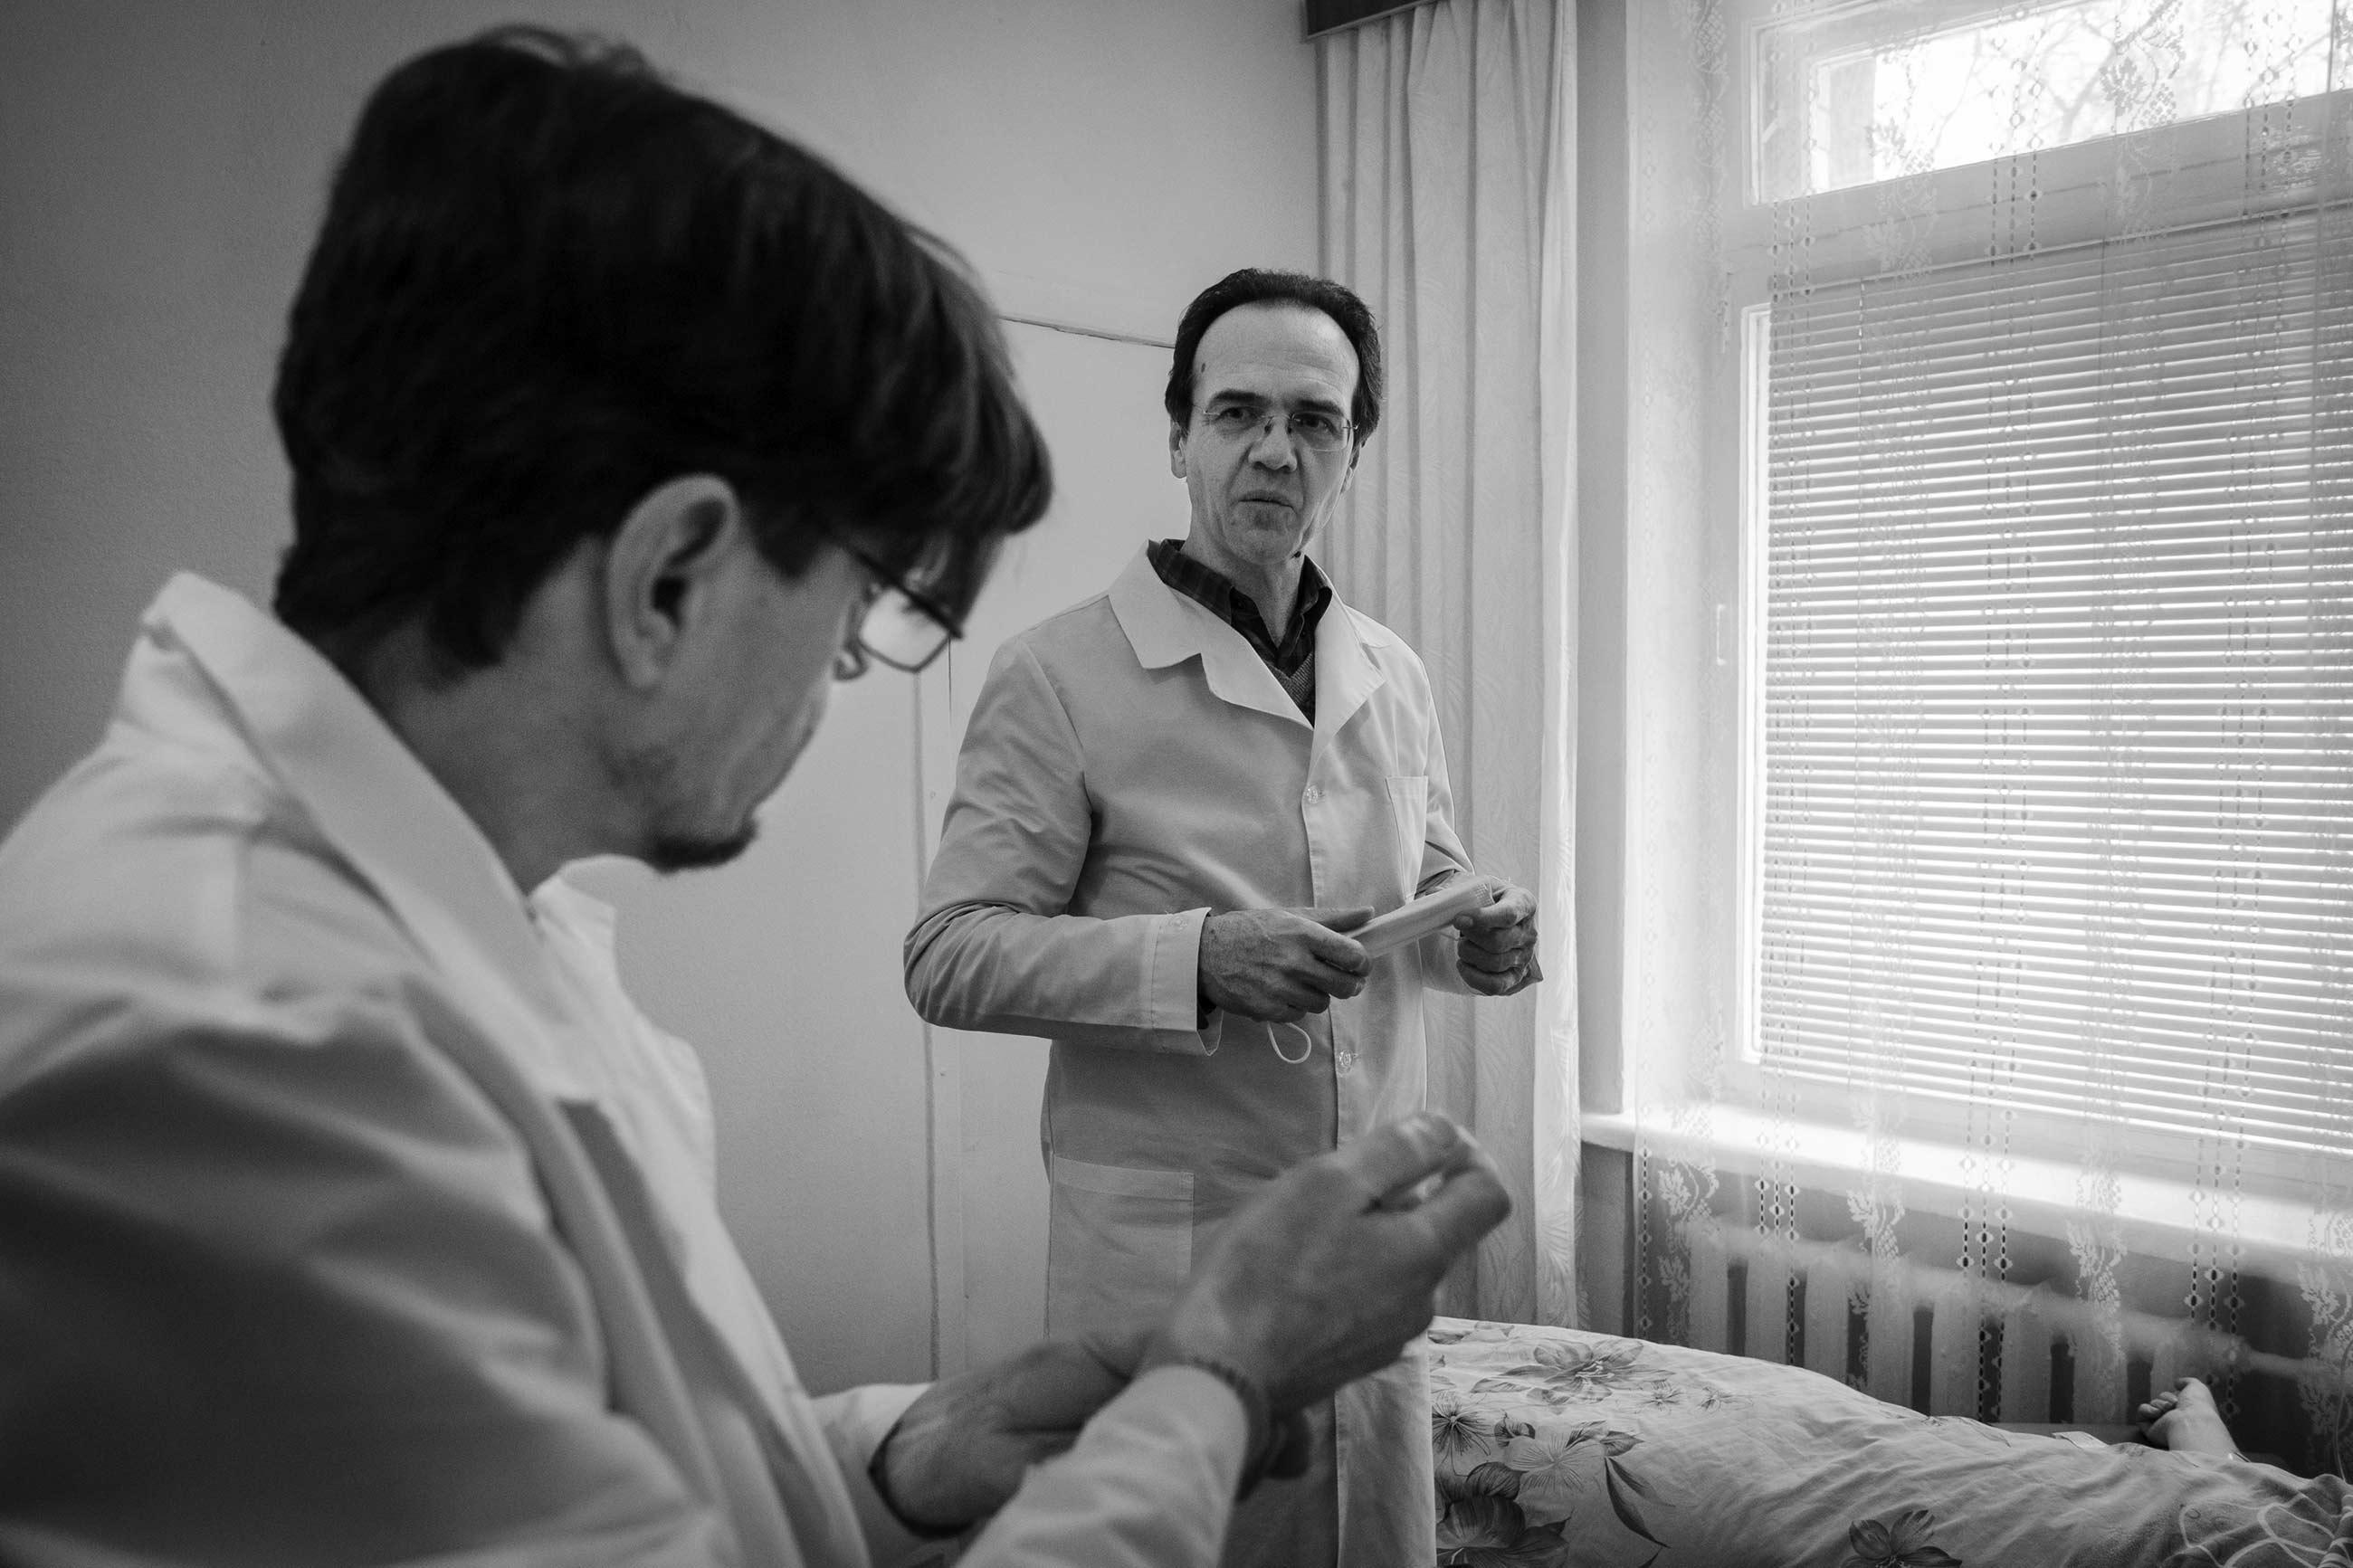 ketamine dsc03146 - <b>From Party Drug to Medicine:</b> How Ketamine is Used to Treat Depression in Ukraine - Заборона